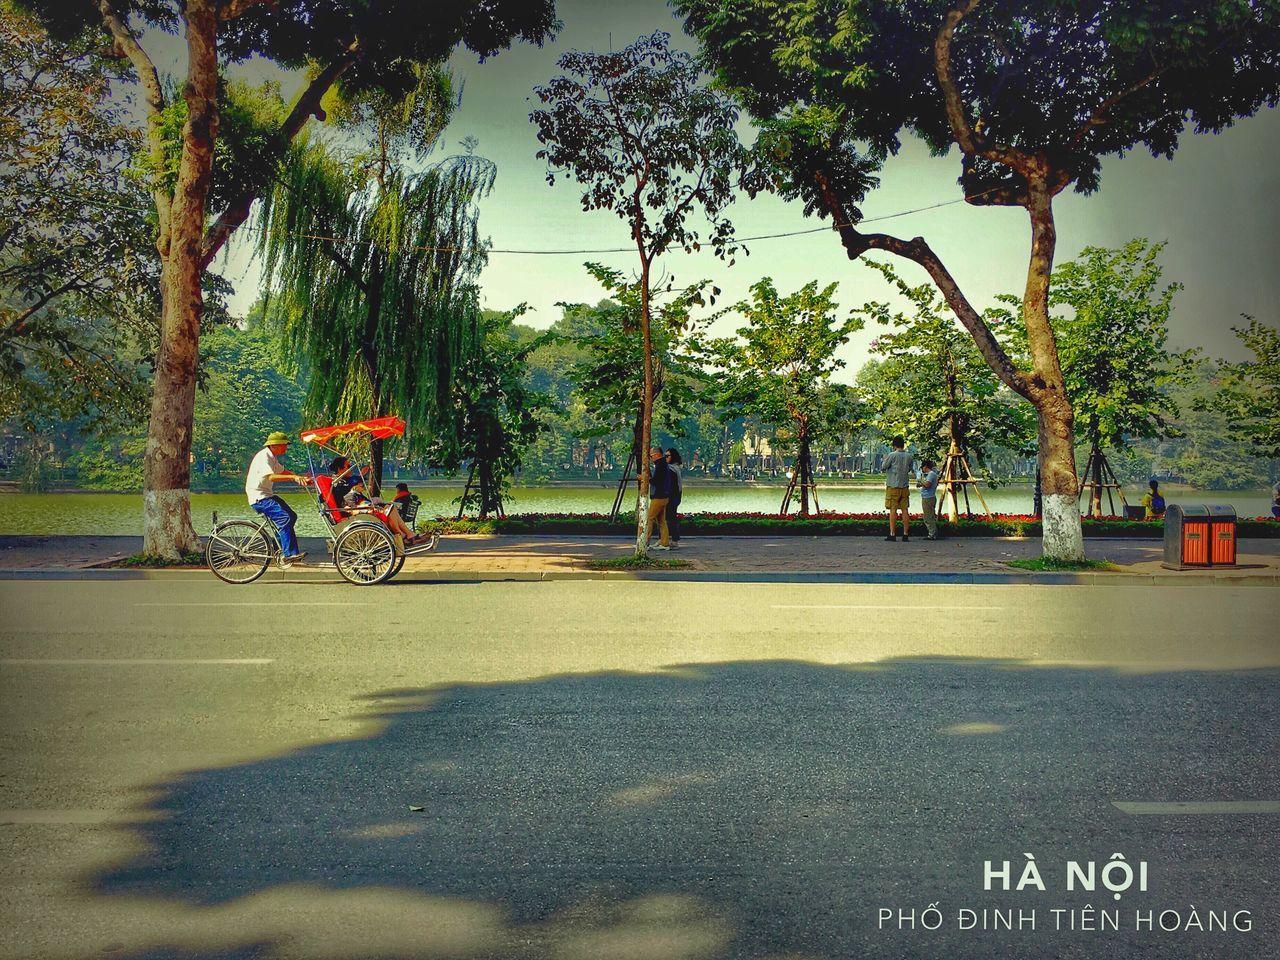 Hanoian